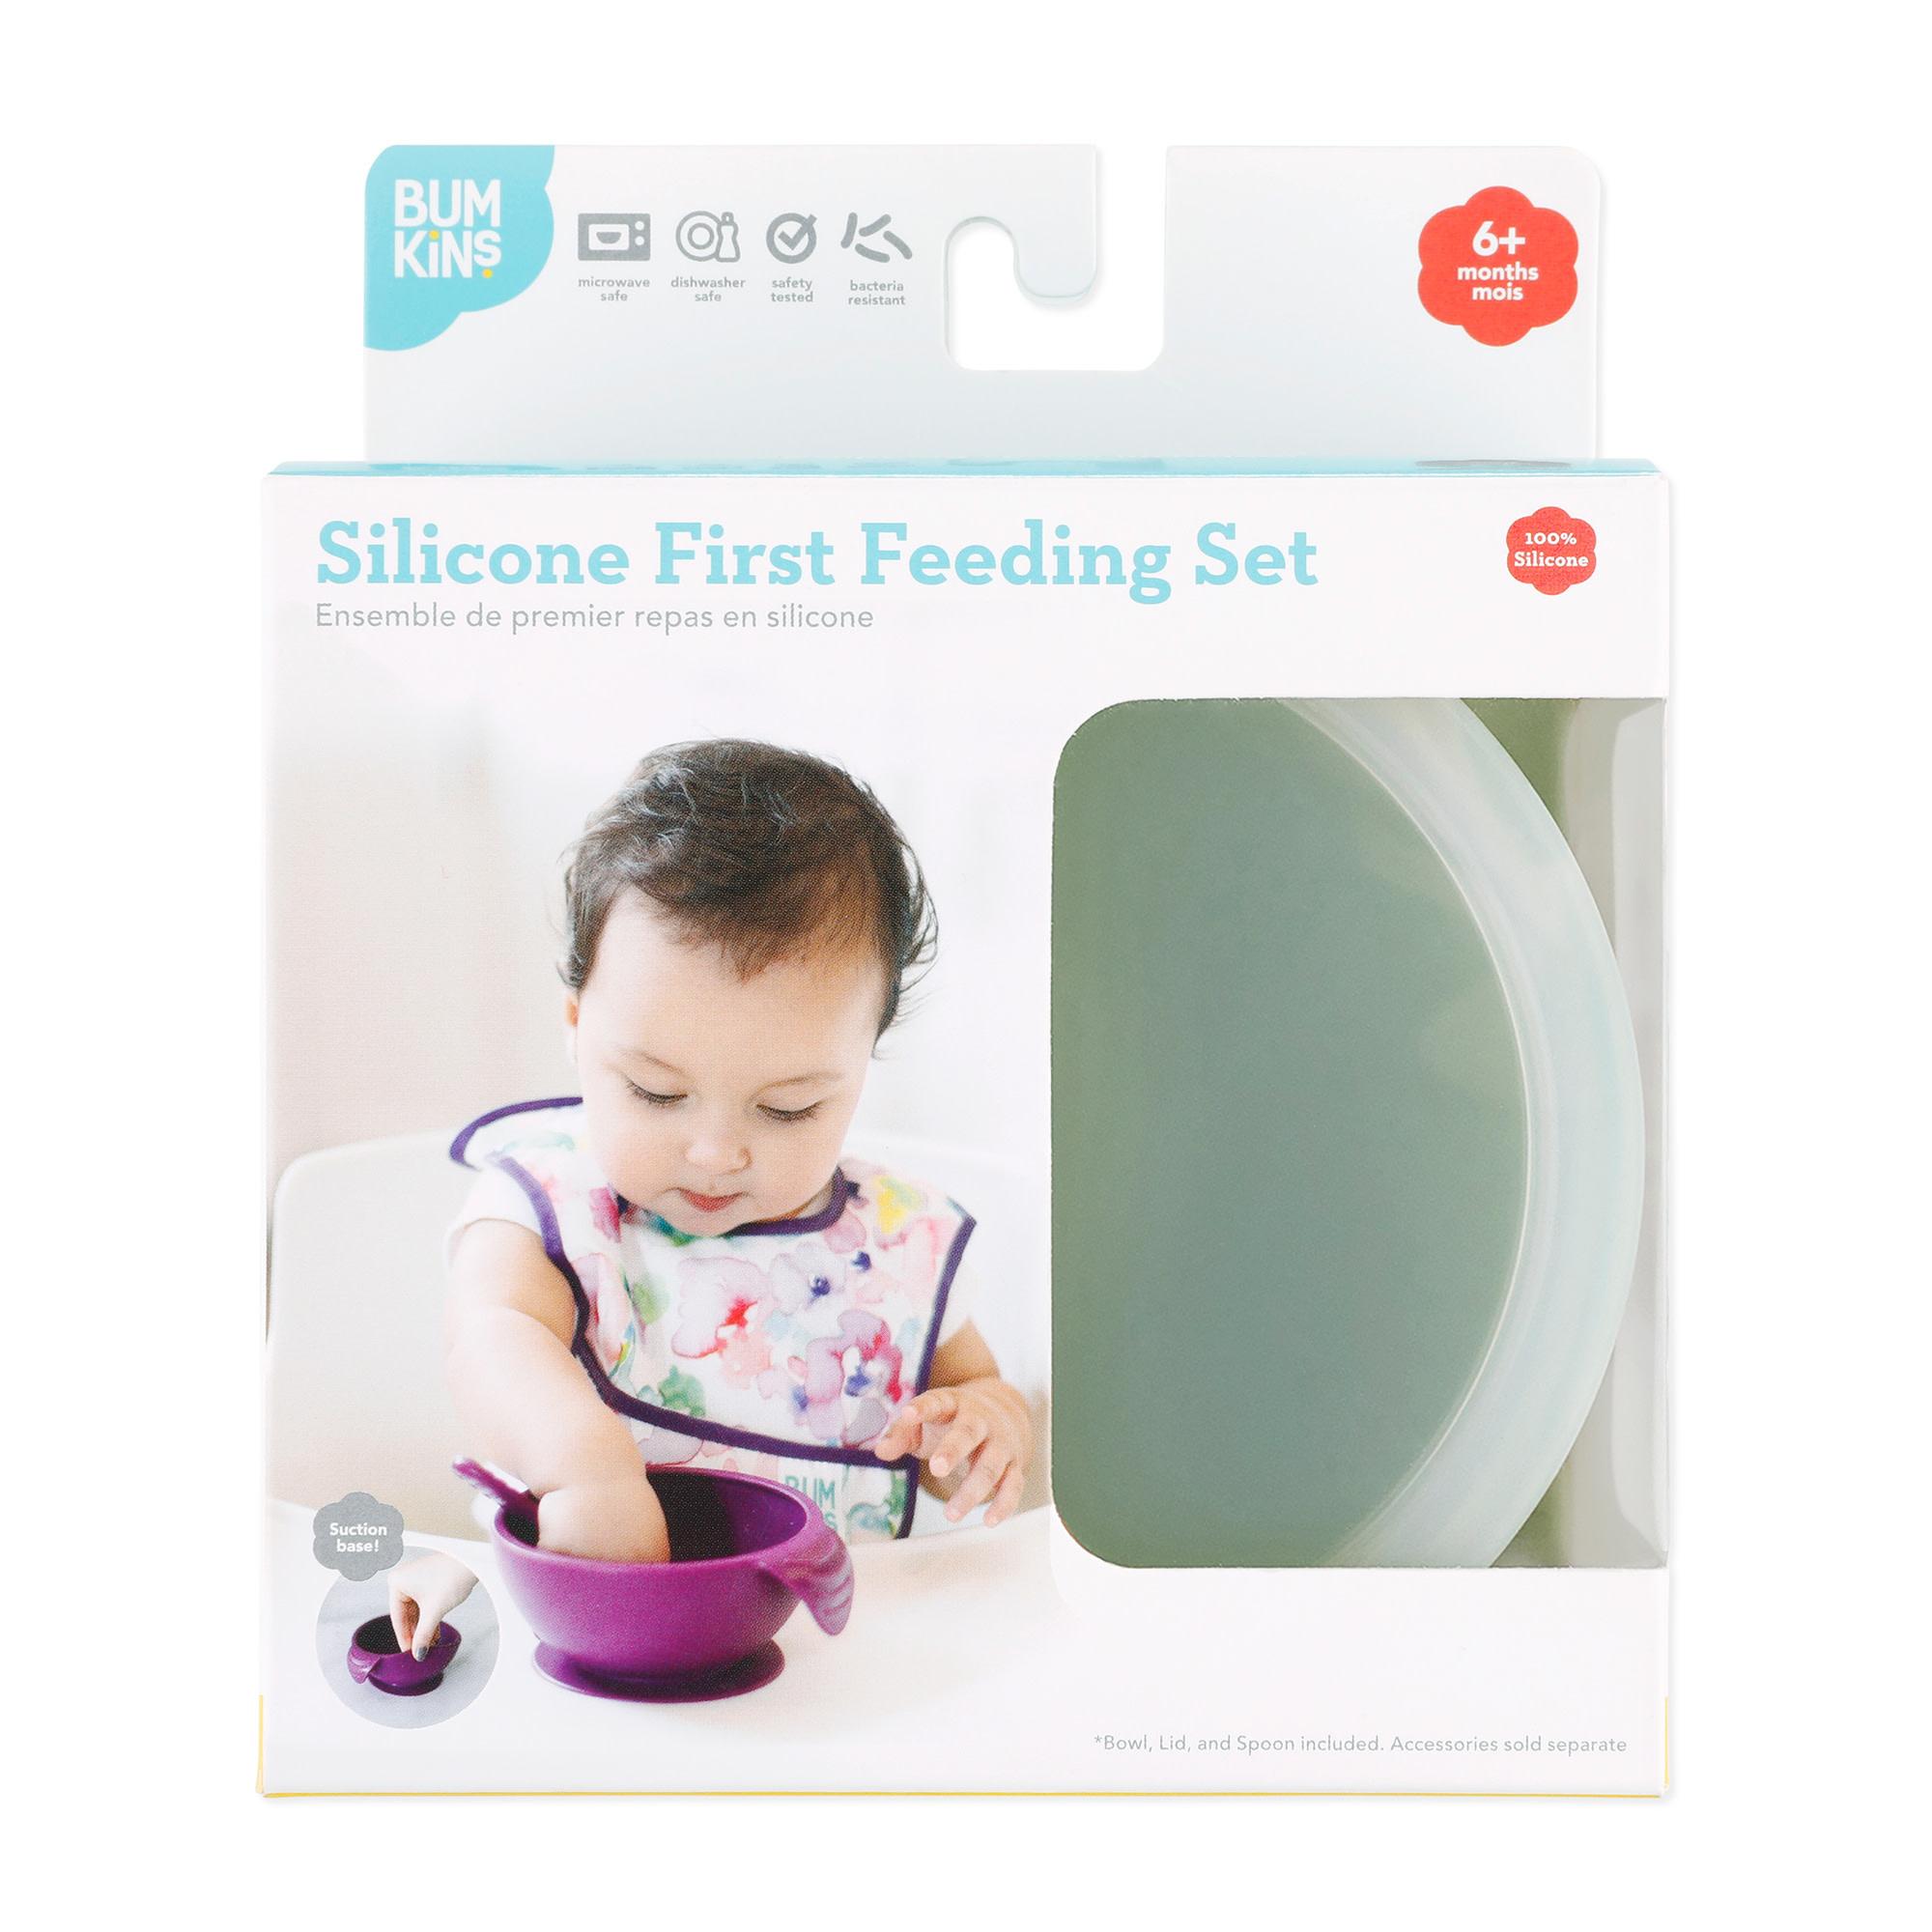 Bumkins Bumkins Silicone First Feeding Set (6m+)